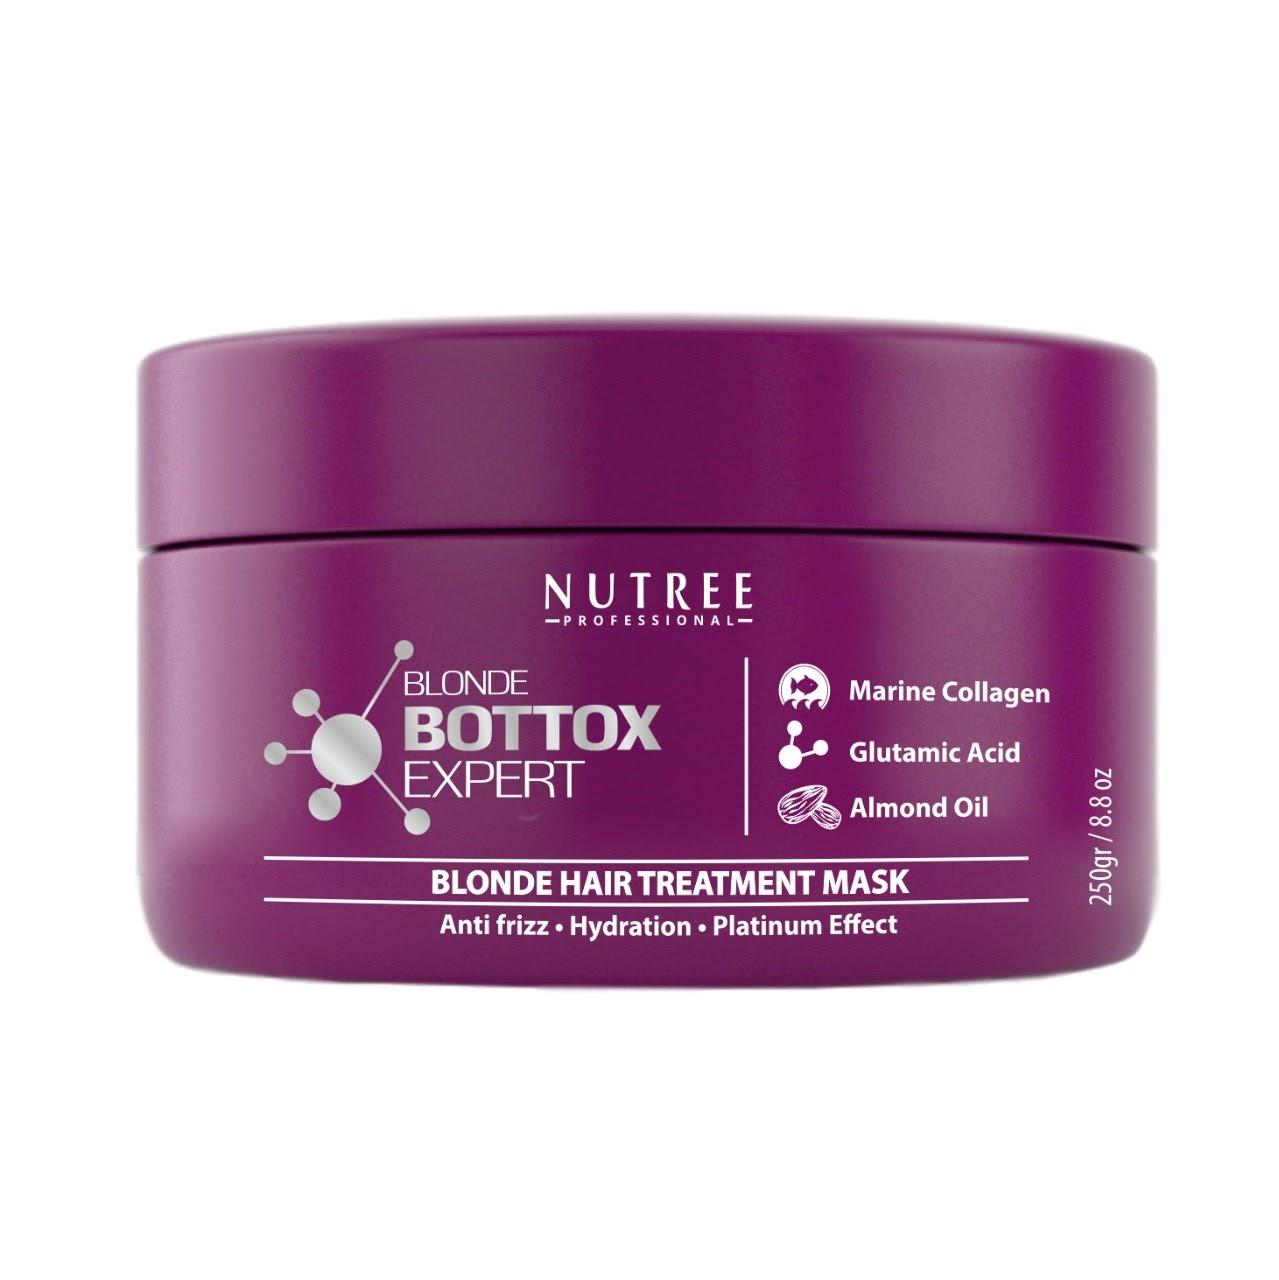 Nutree Blonde Bottox Expert - Ботокс для светлых волос, 250 гр